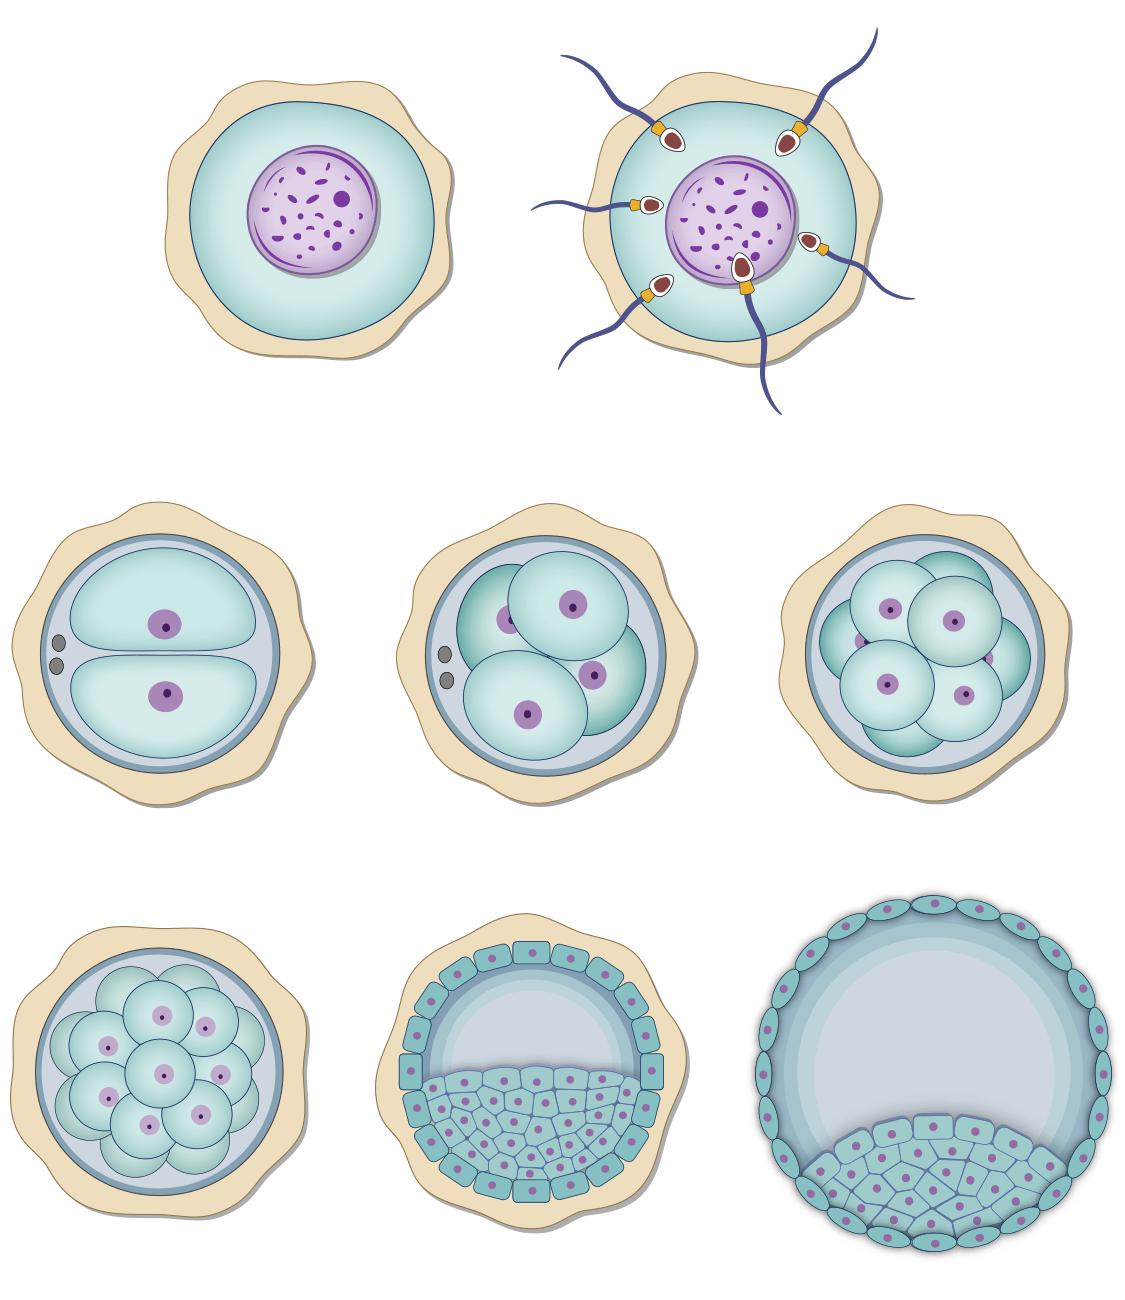 Embryonic development: pre-implantation days 1-6